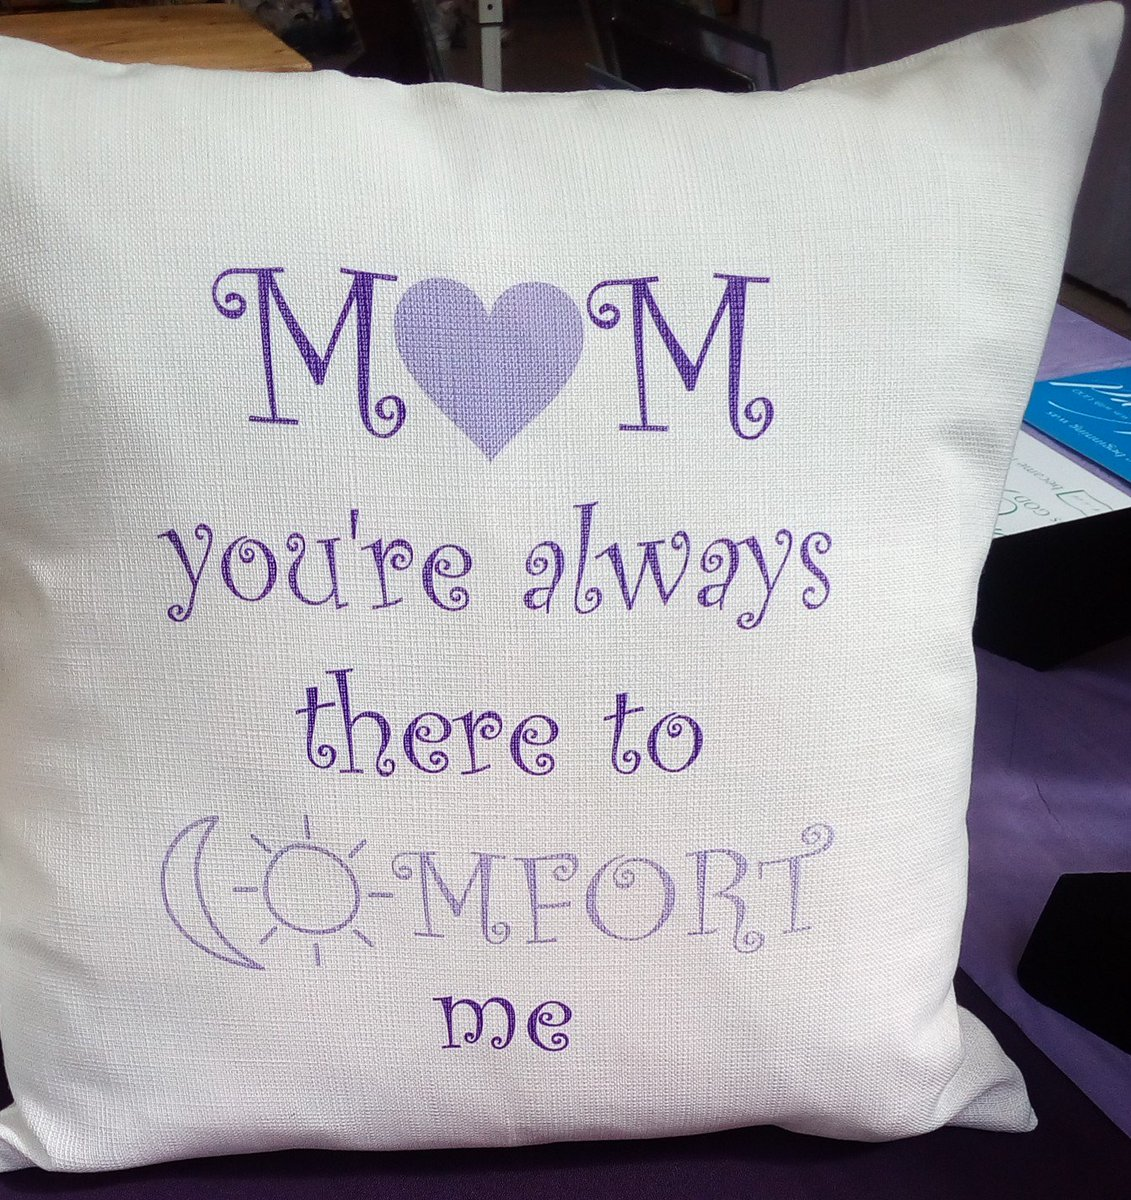 For comfort cushion